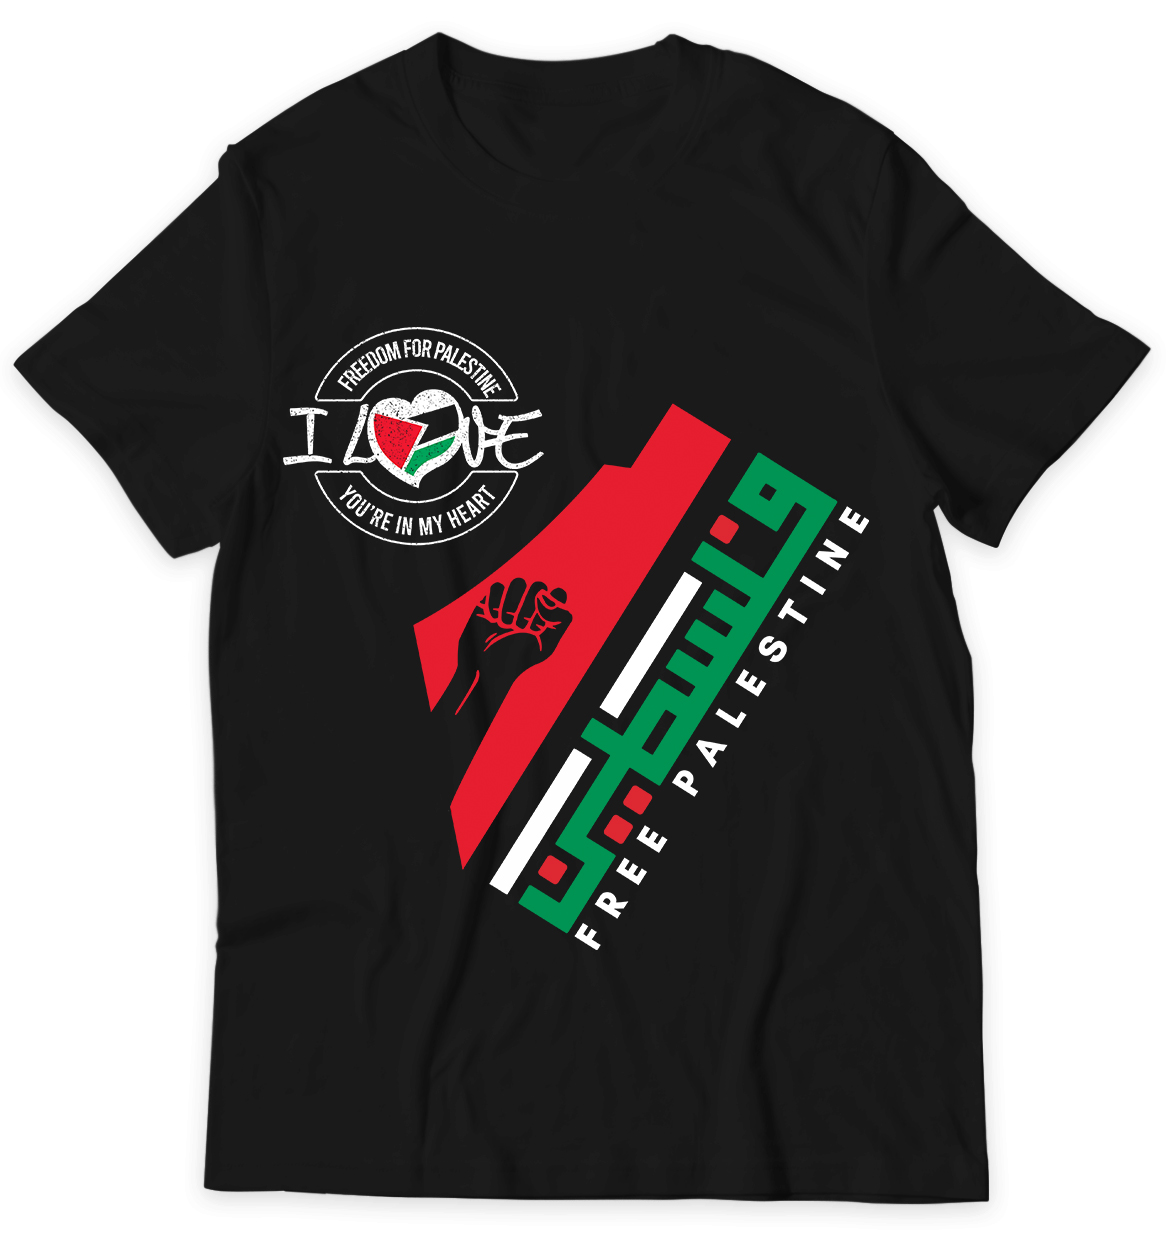 Humanitarian Fund Raising for Palestine